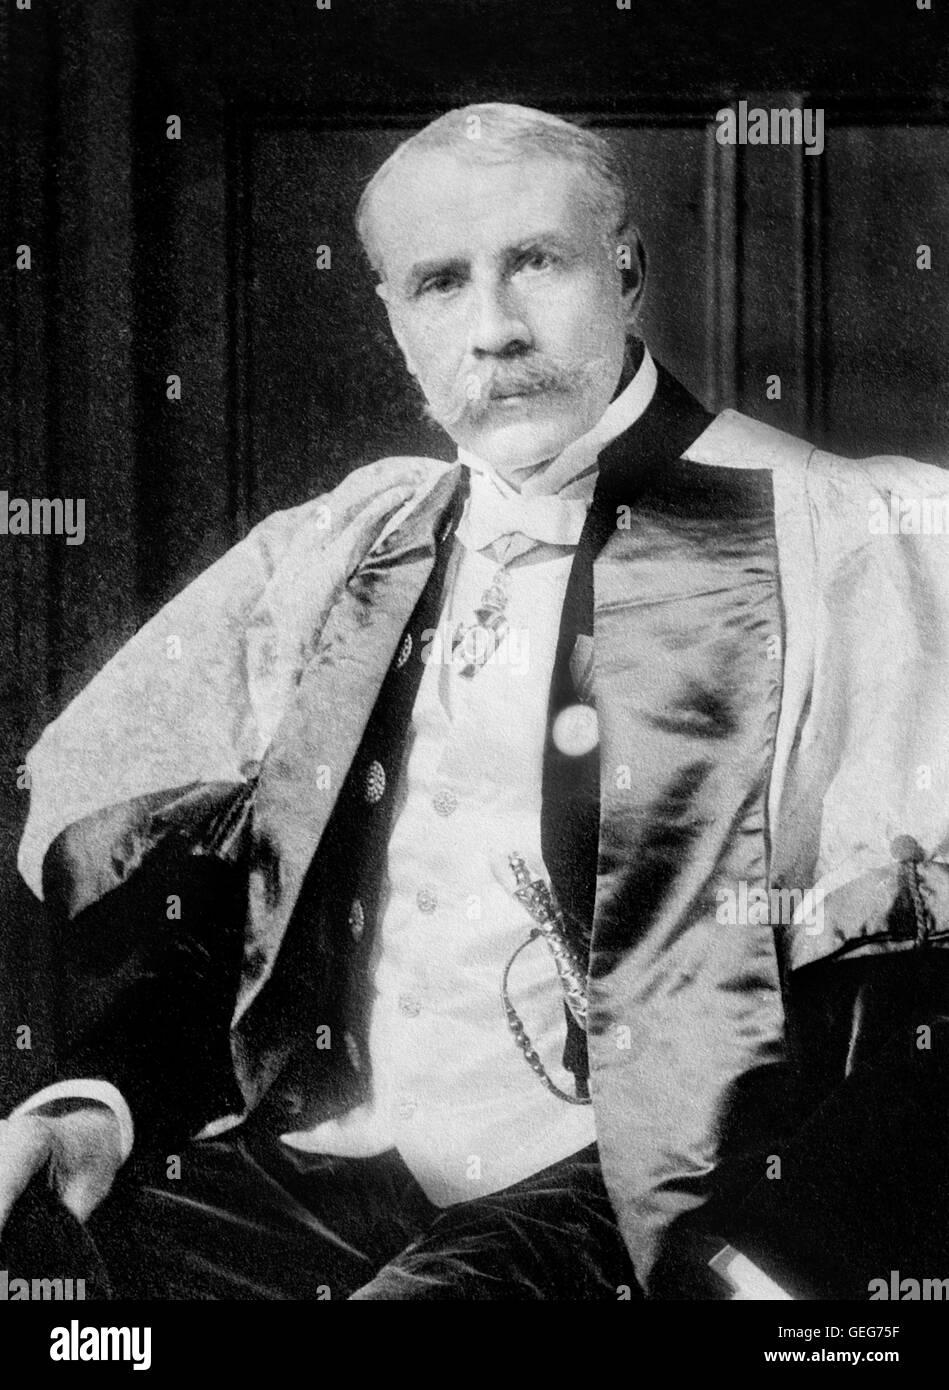 Edward Elgar. Portrait of the English composer Sir Edward William Elgar (1857-1934). Photo from Bain News Service, - Stock Image